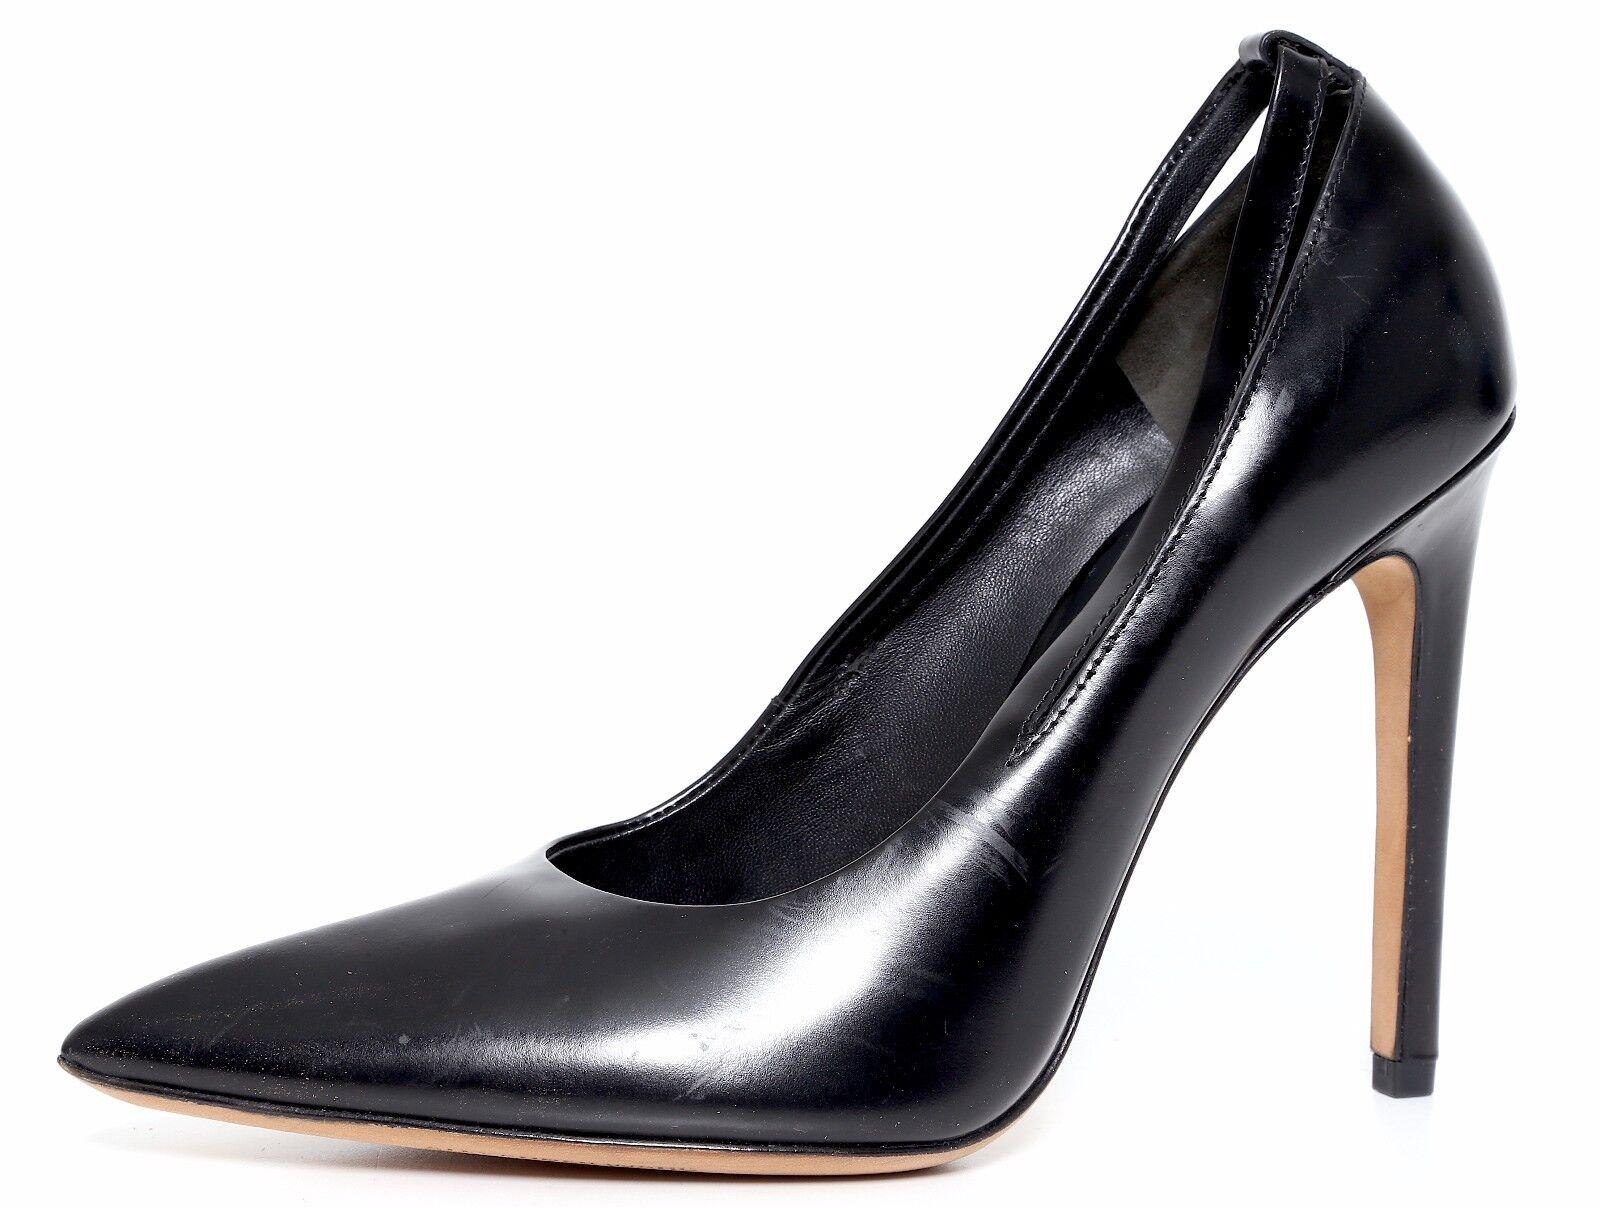 Alexander Wang Bomba de Cuero Negro Negro Negro para Mujeres Talla 36 EUR 1106  buena calidad